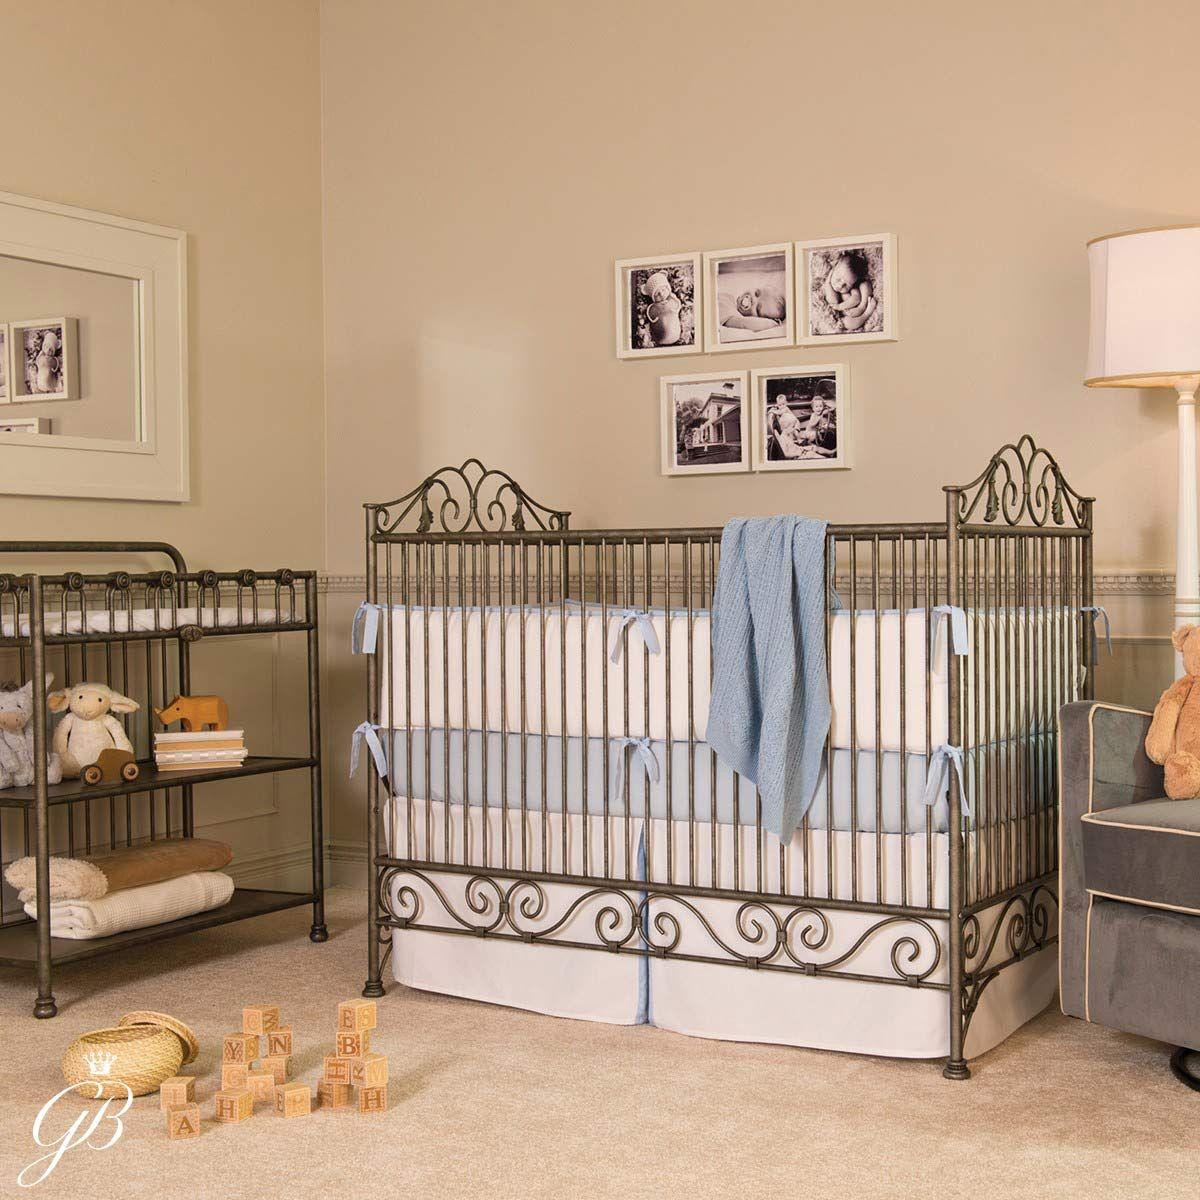 top baby furniture brands. Top 25 Nursery Furniture / Gigi Brooks Baby Brands A